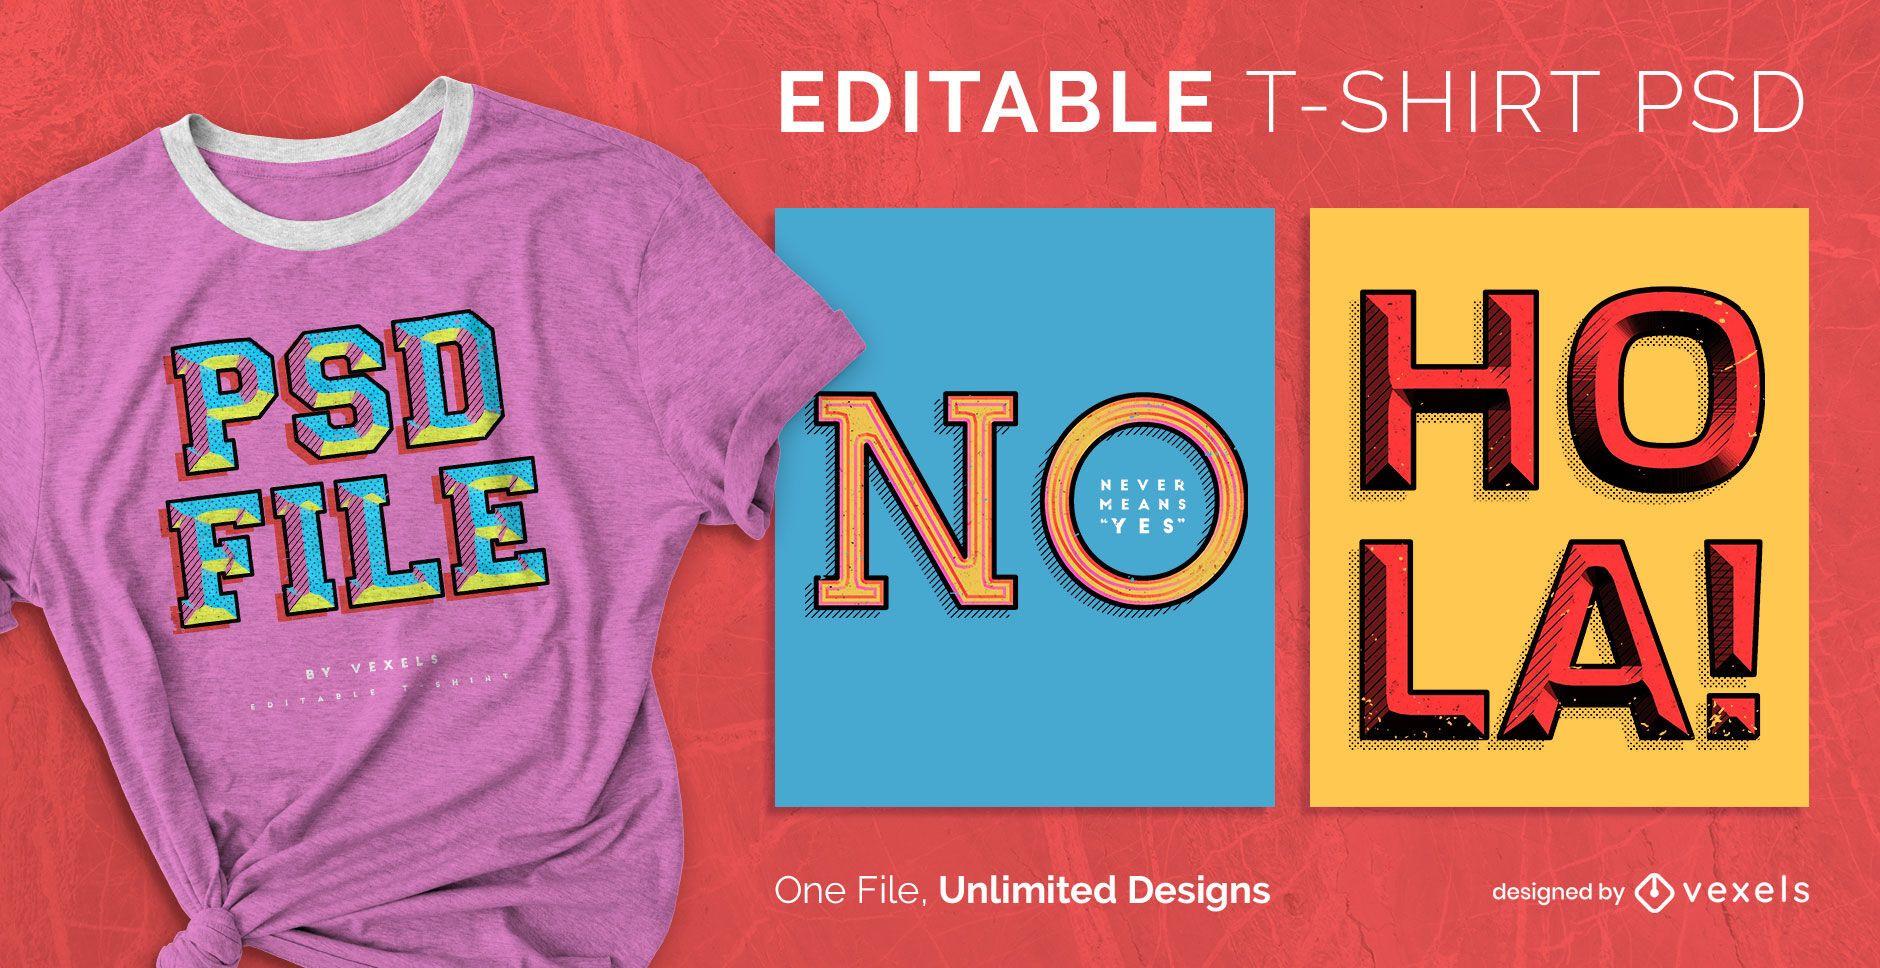 Retro text effect PSD scalable t-shirt design